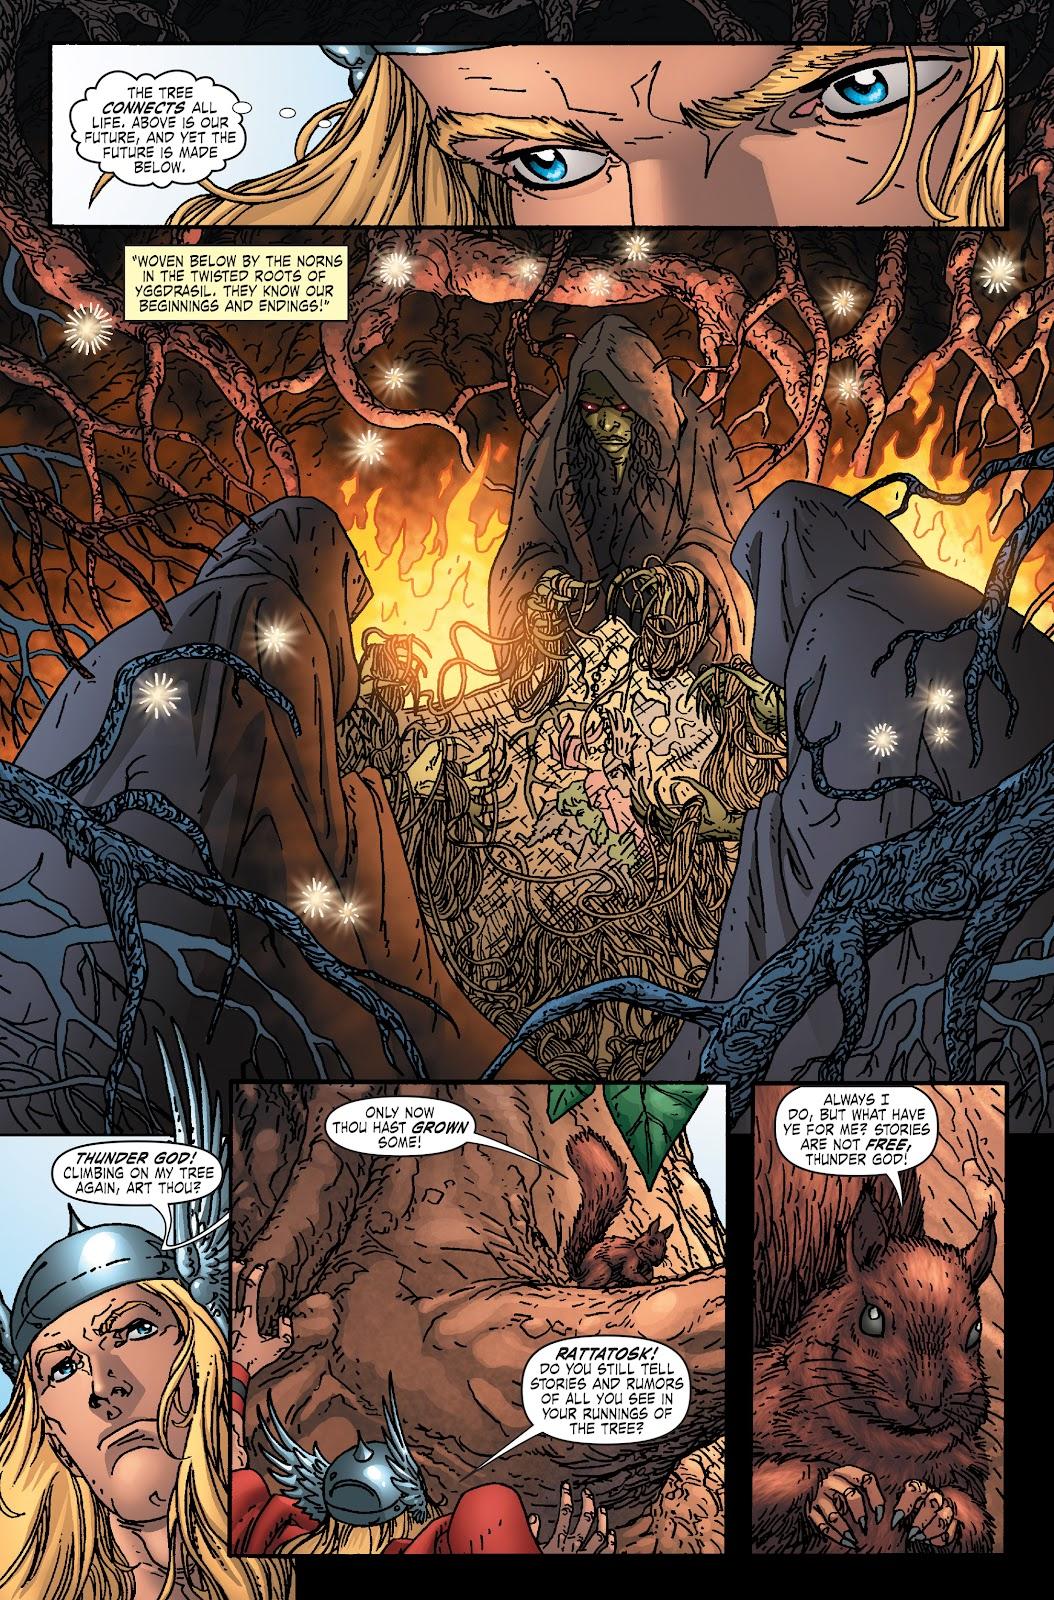 Read online Thor: Ragnaroks comic -  Issue # TPB (Part 1) - 34